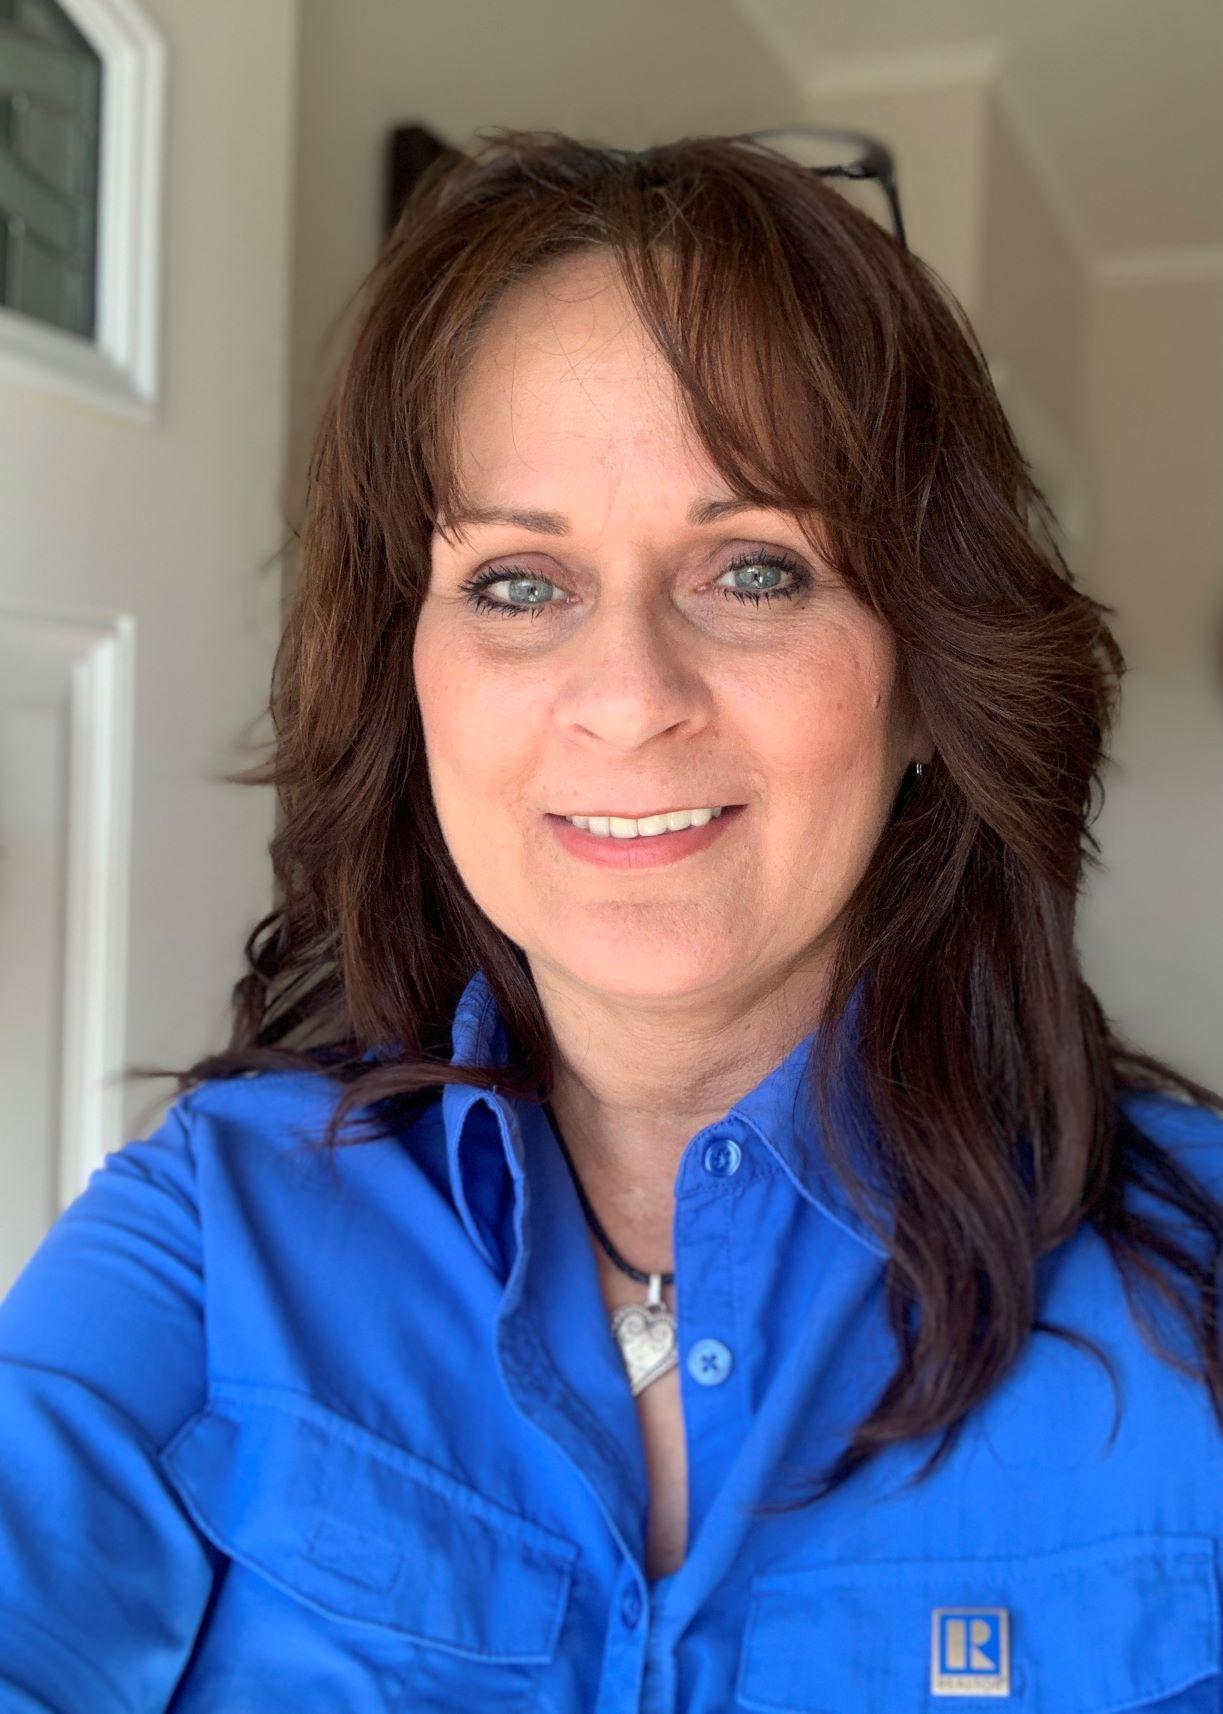 Angie Camlin